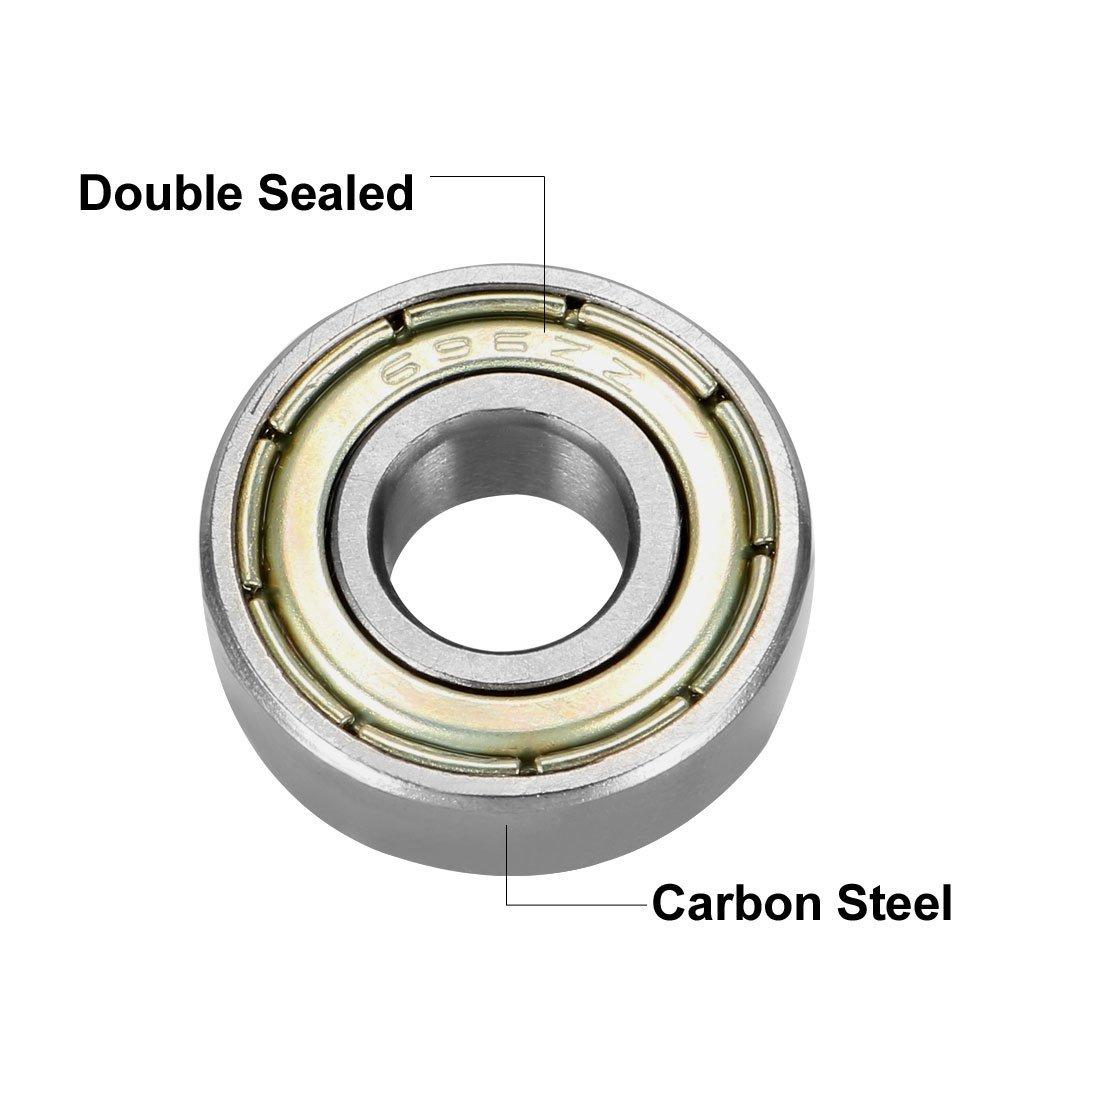 696ZZ Deep Groove Ball Bearings Double Shield 696-2Z 1080096 6 mm x 15 mm x 5 mm Carbon Steel Bearings Pack of 4